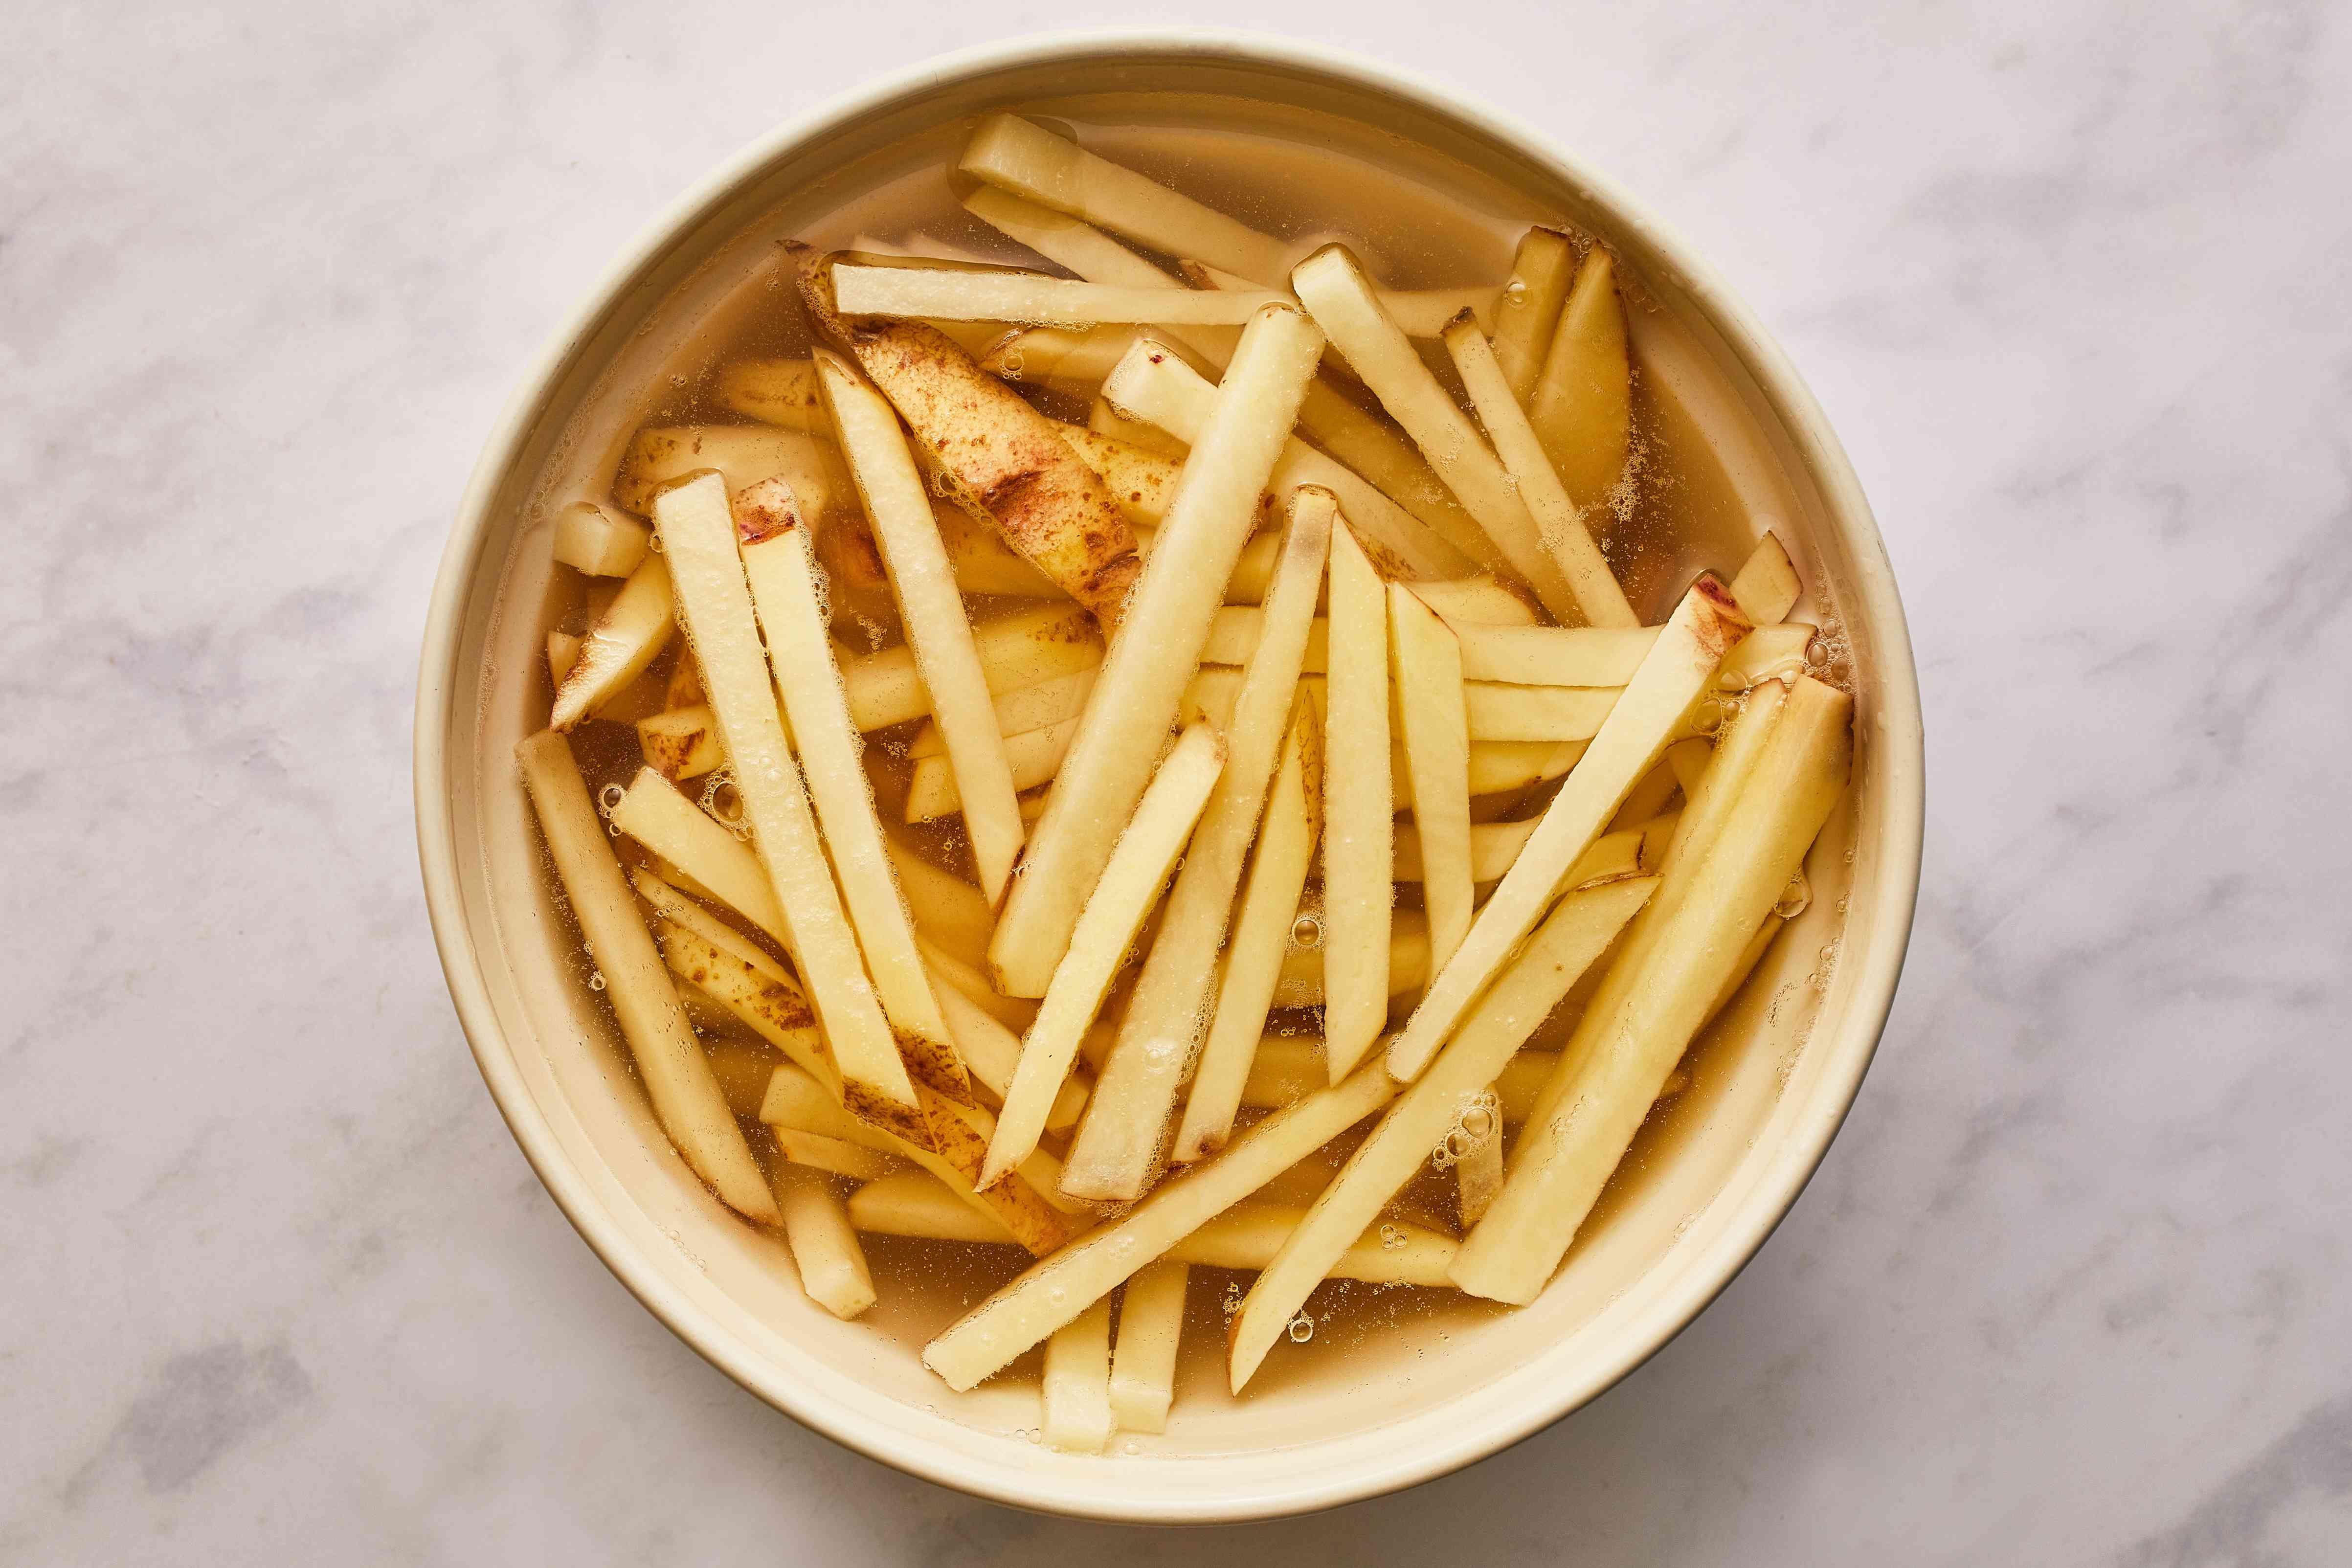 Soaking potatoes for fries